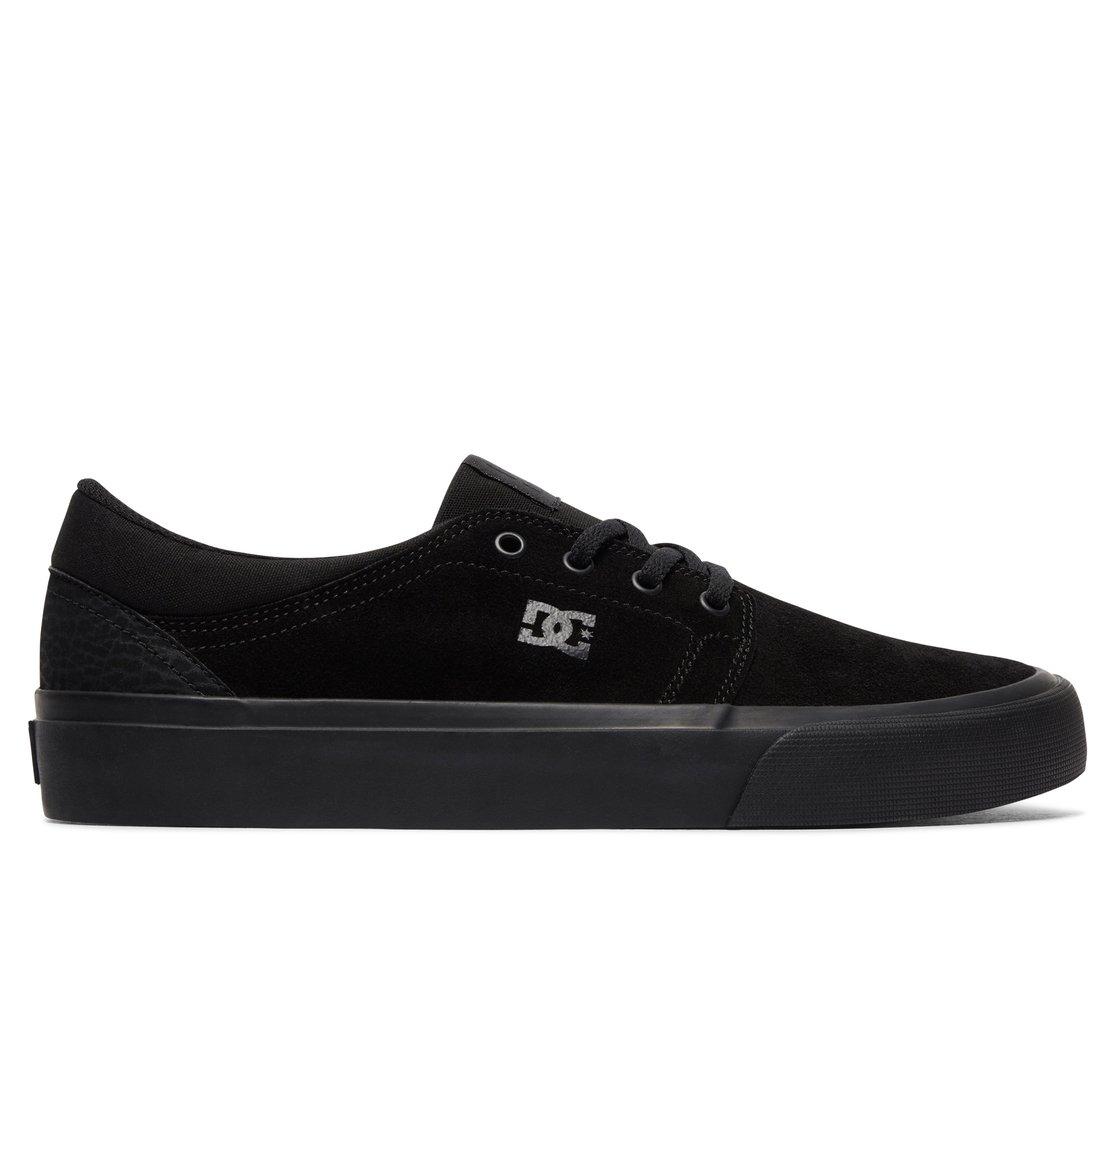 dc shoes Trase SD - Scarpe da Uomo - Black - DC Shoes